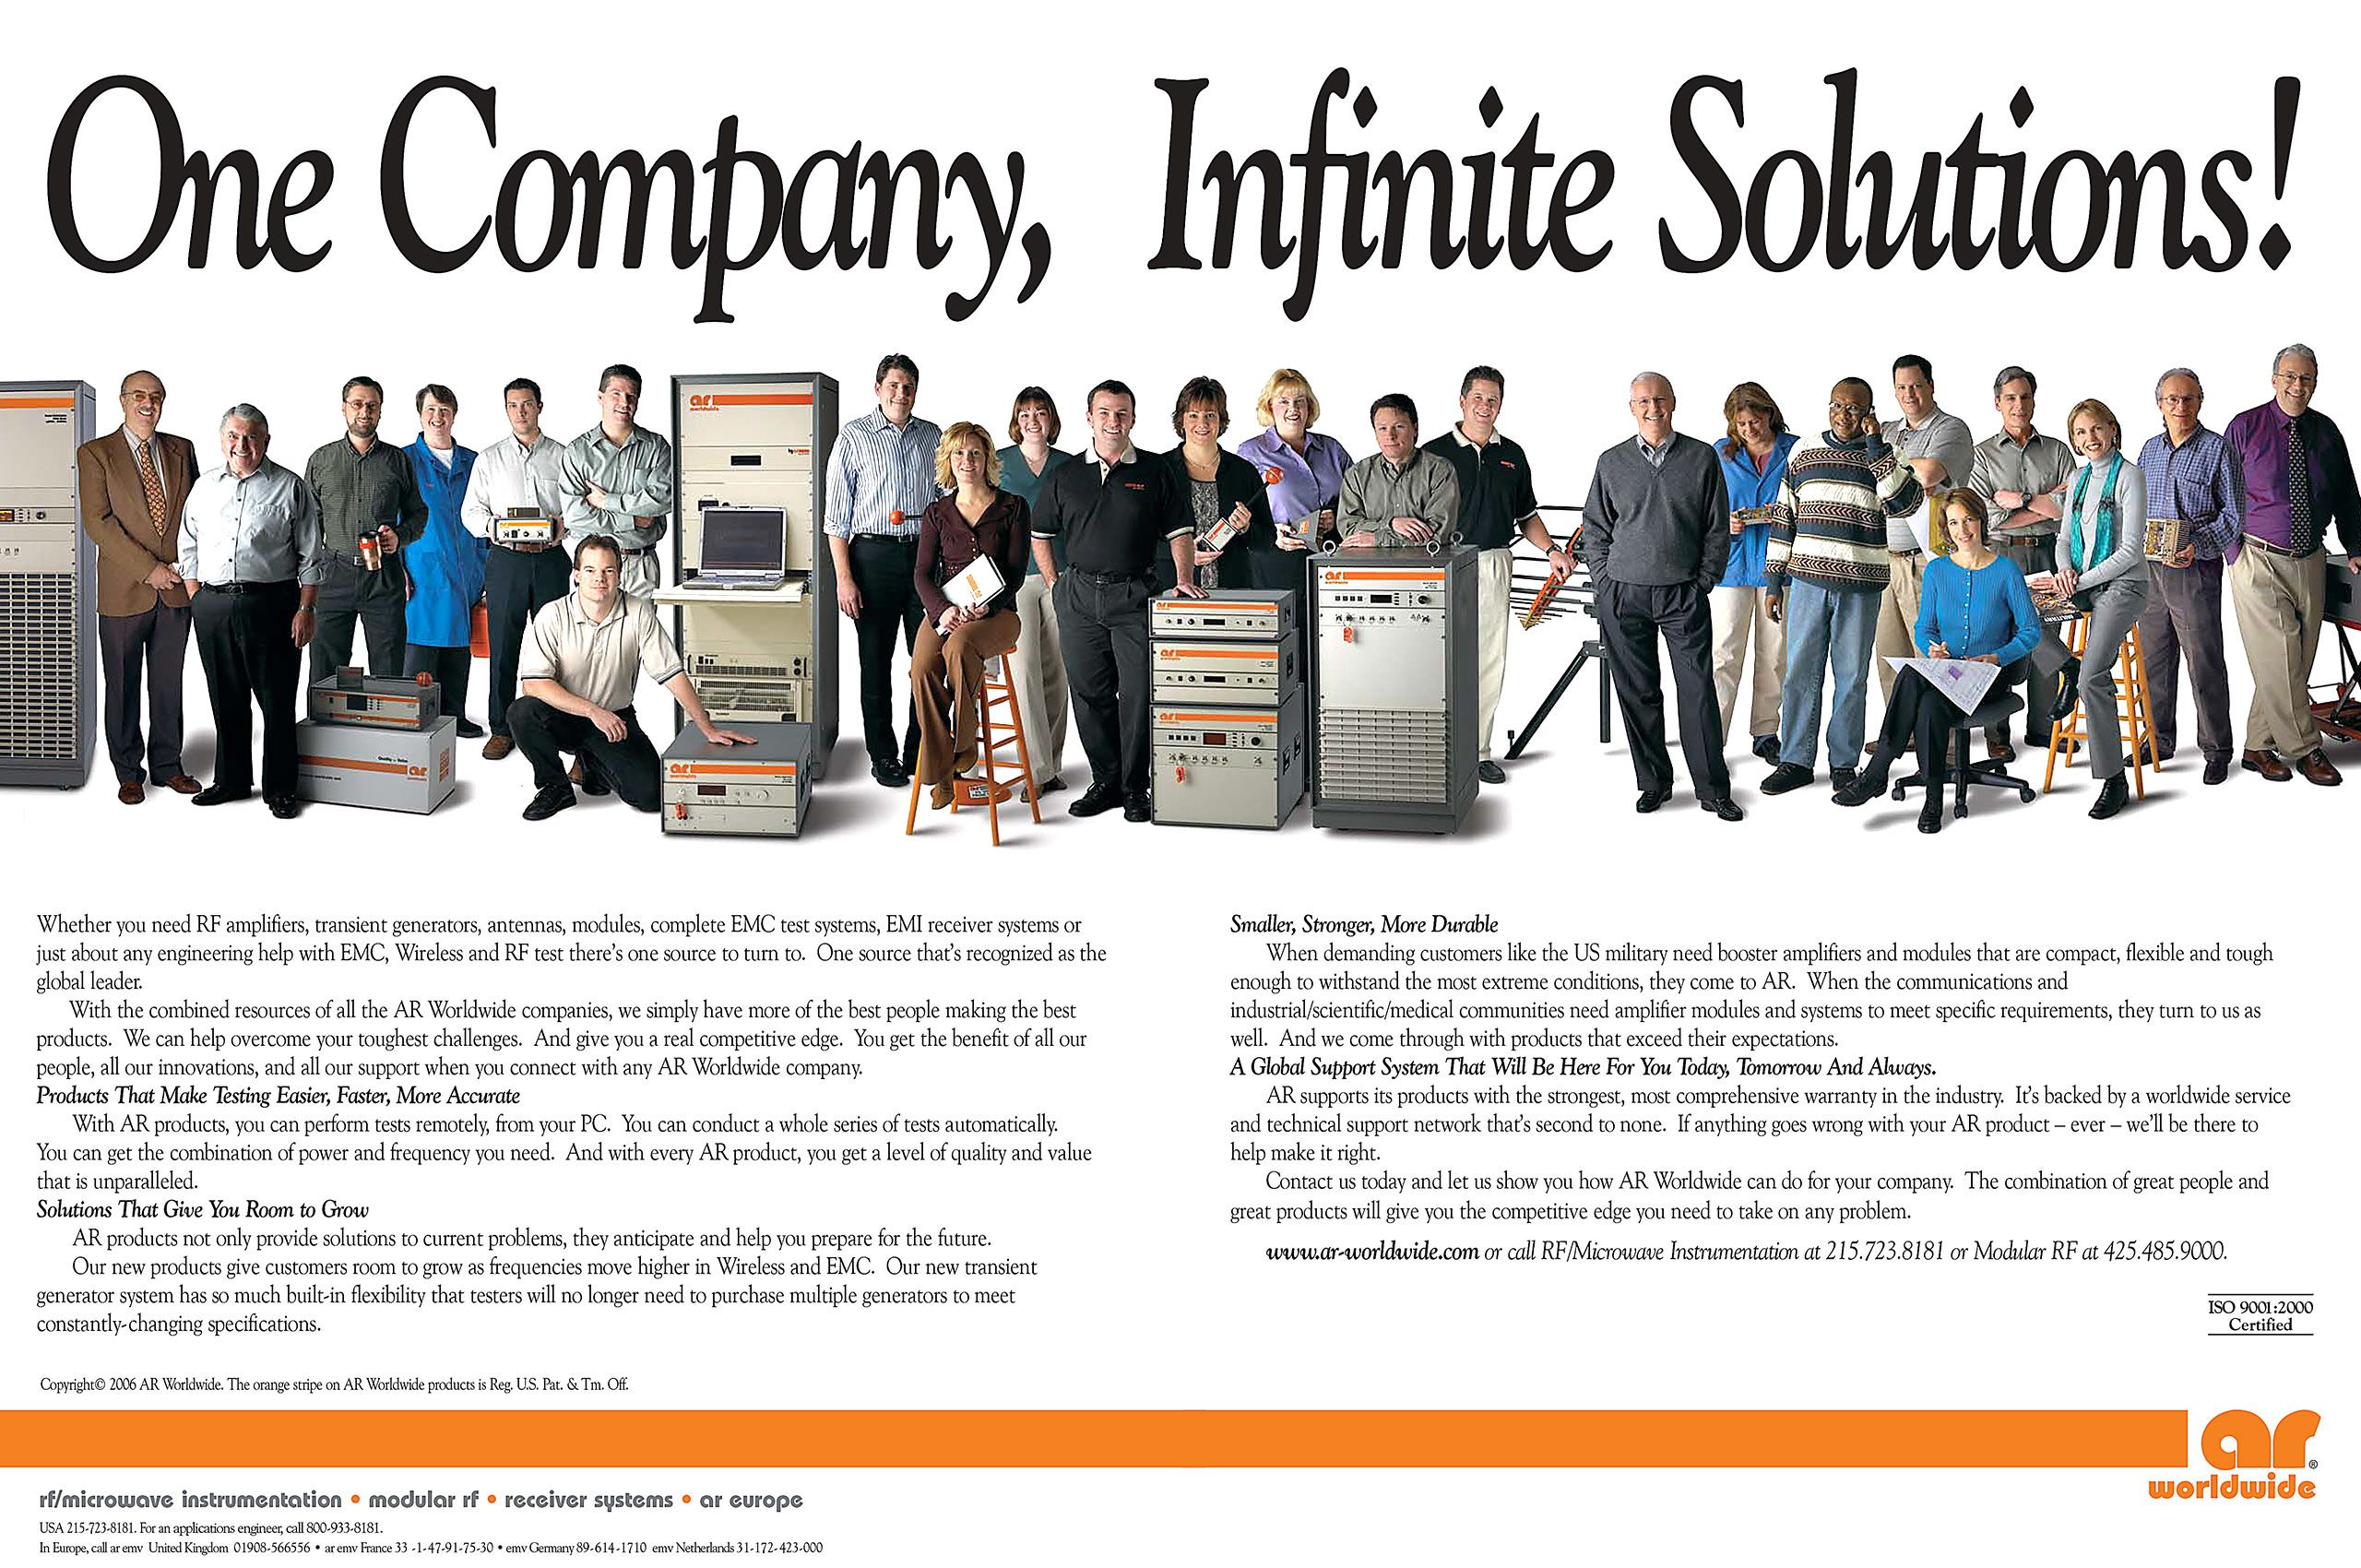 Infinite_Solutions_spread.jpg